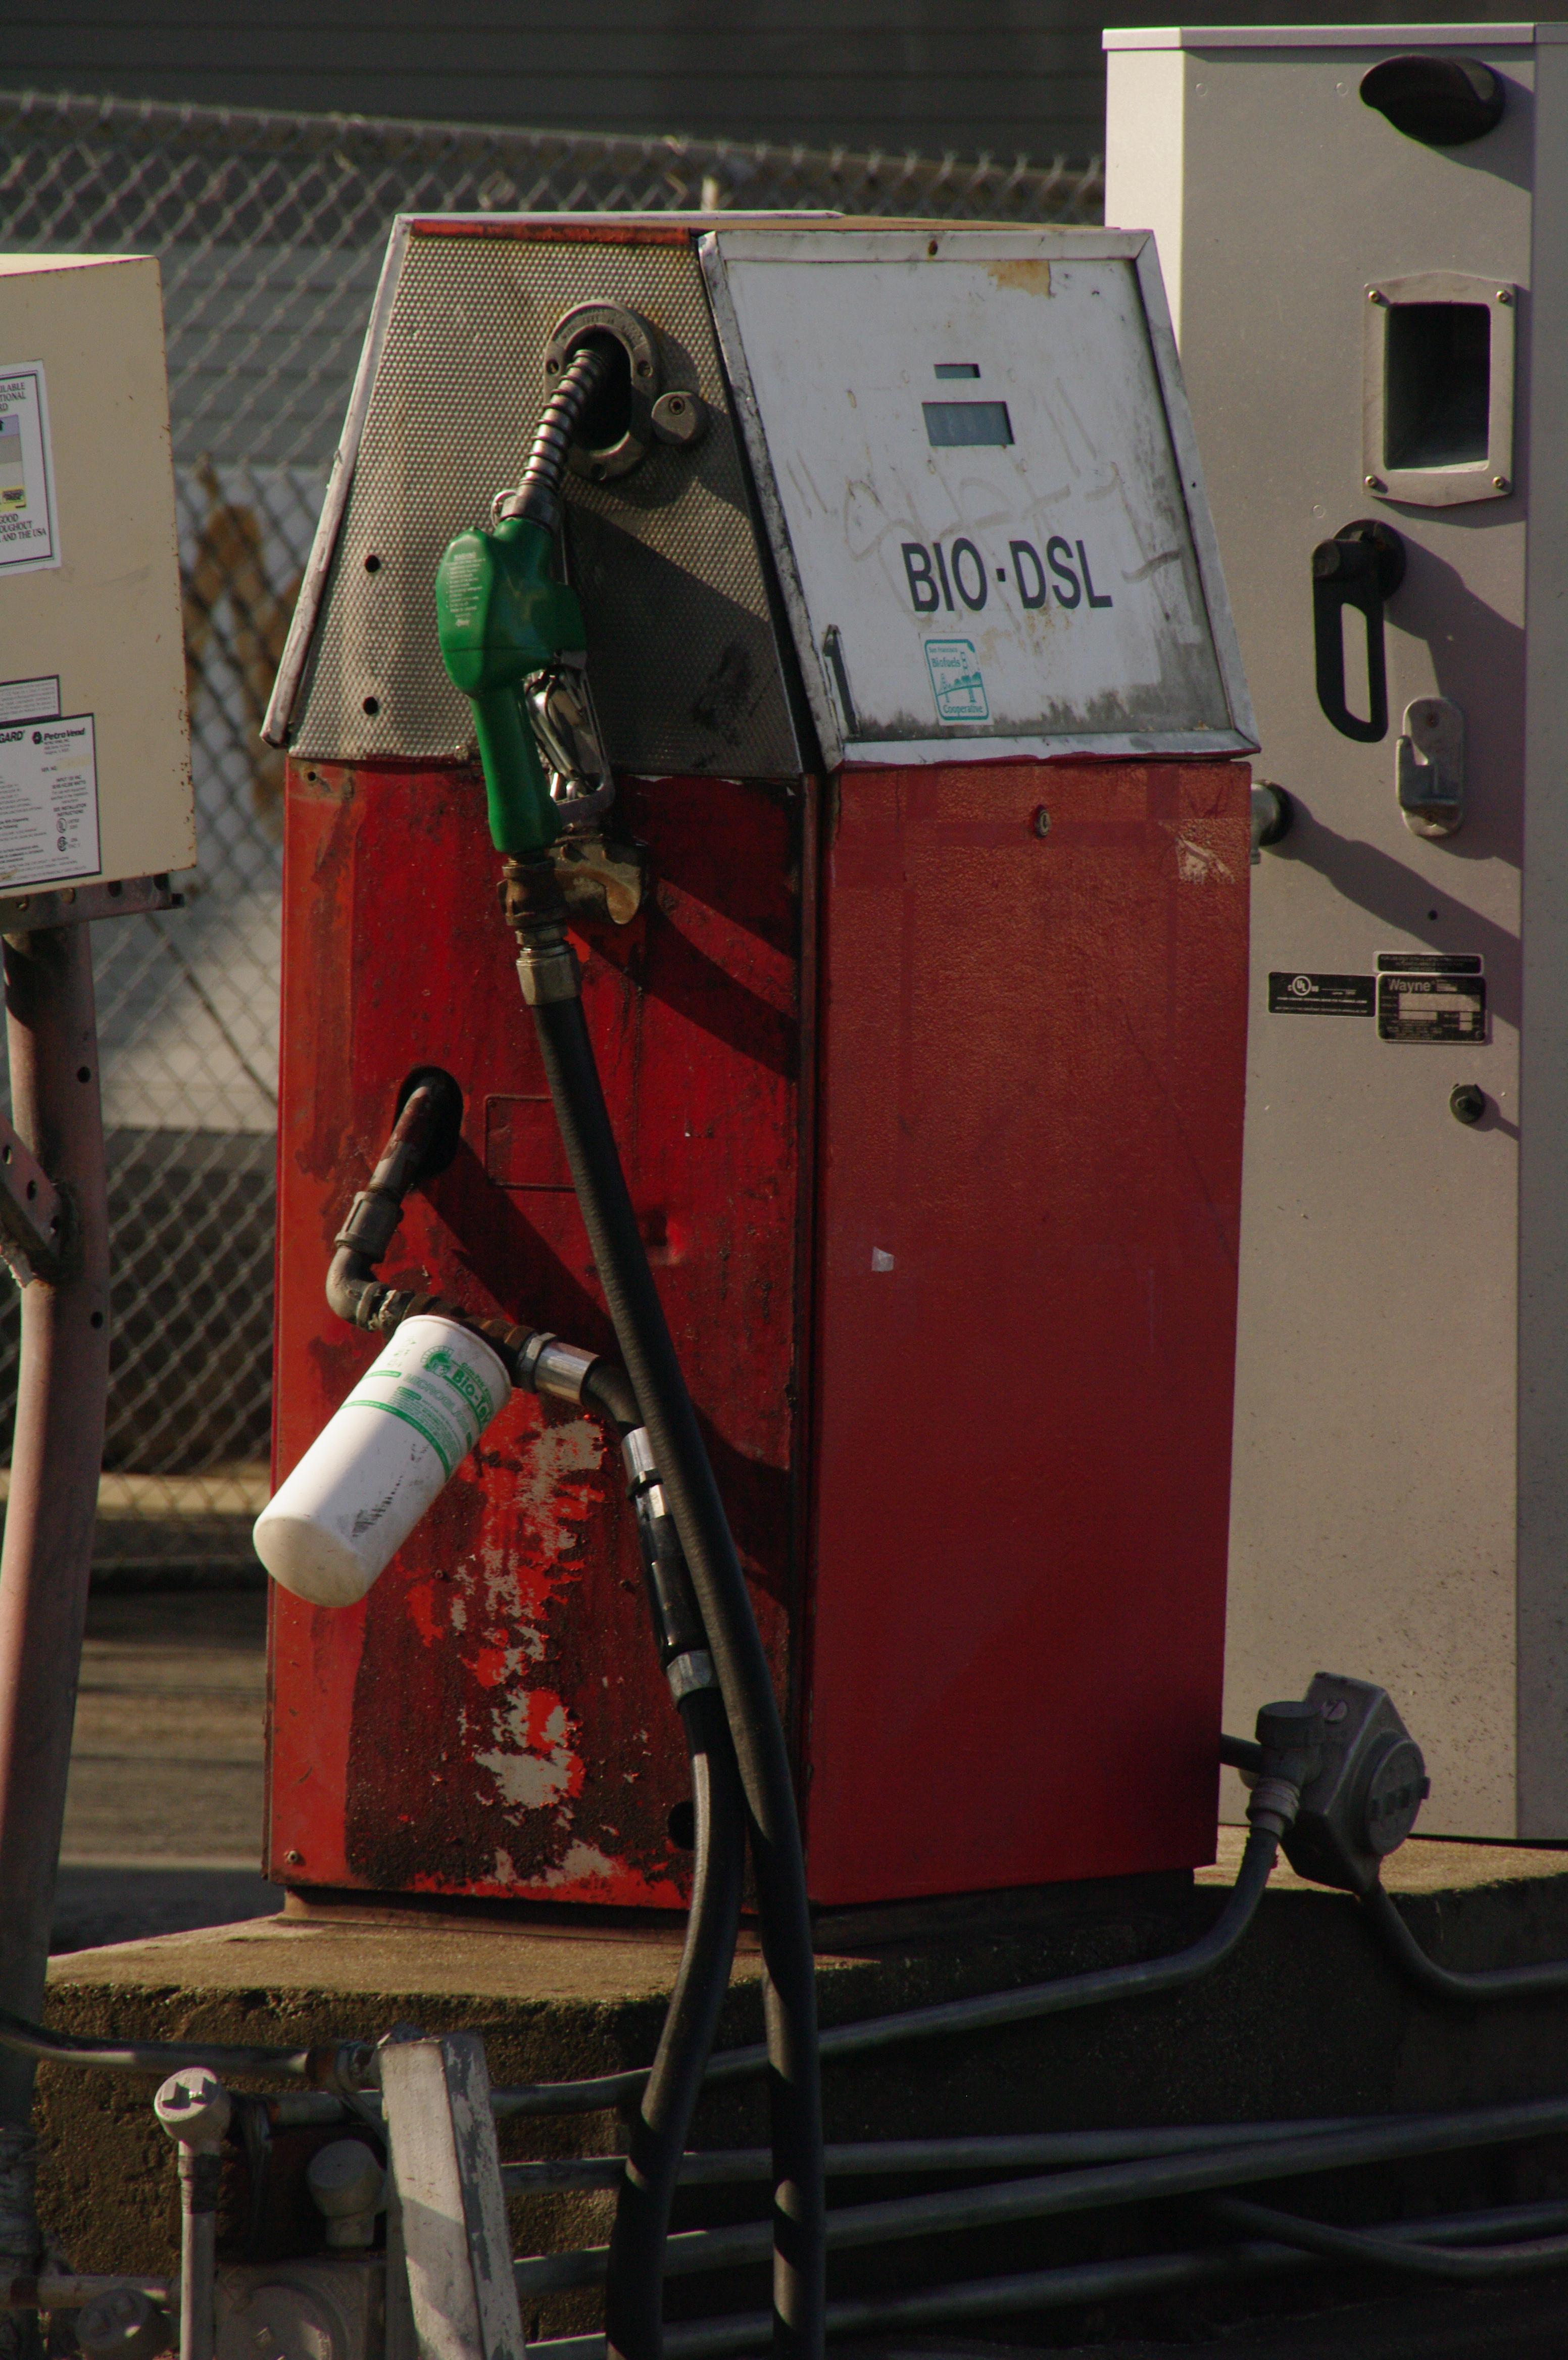 Biodiesel, sustituto del diesel convencional